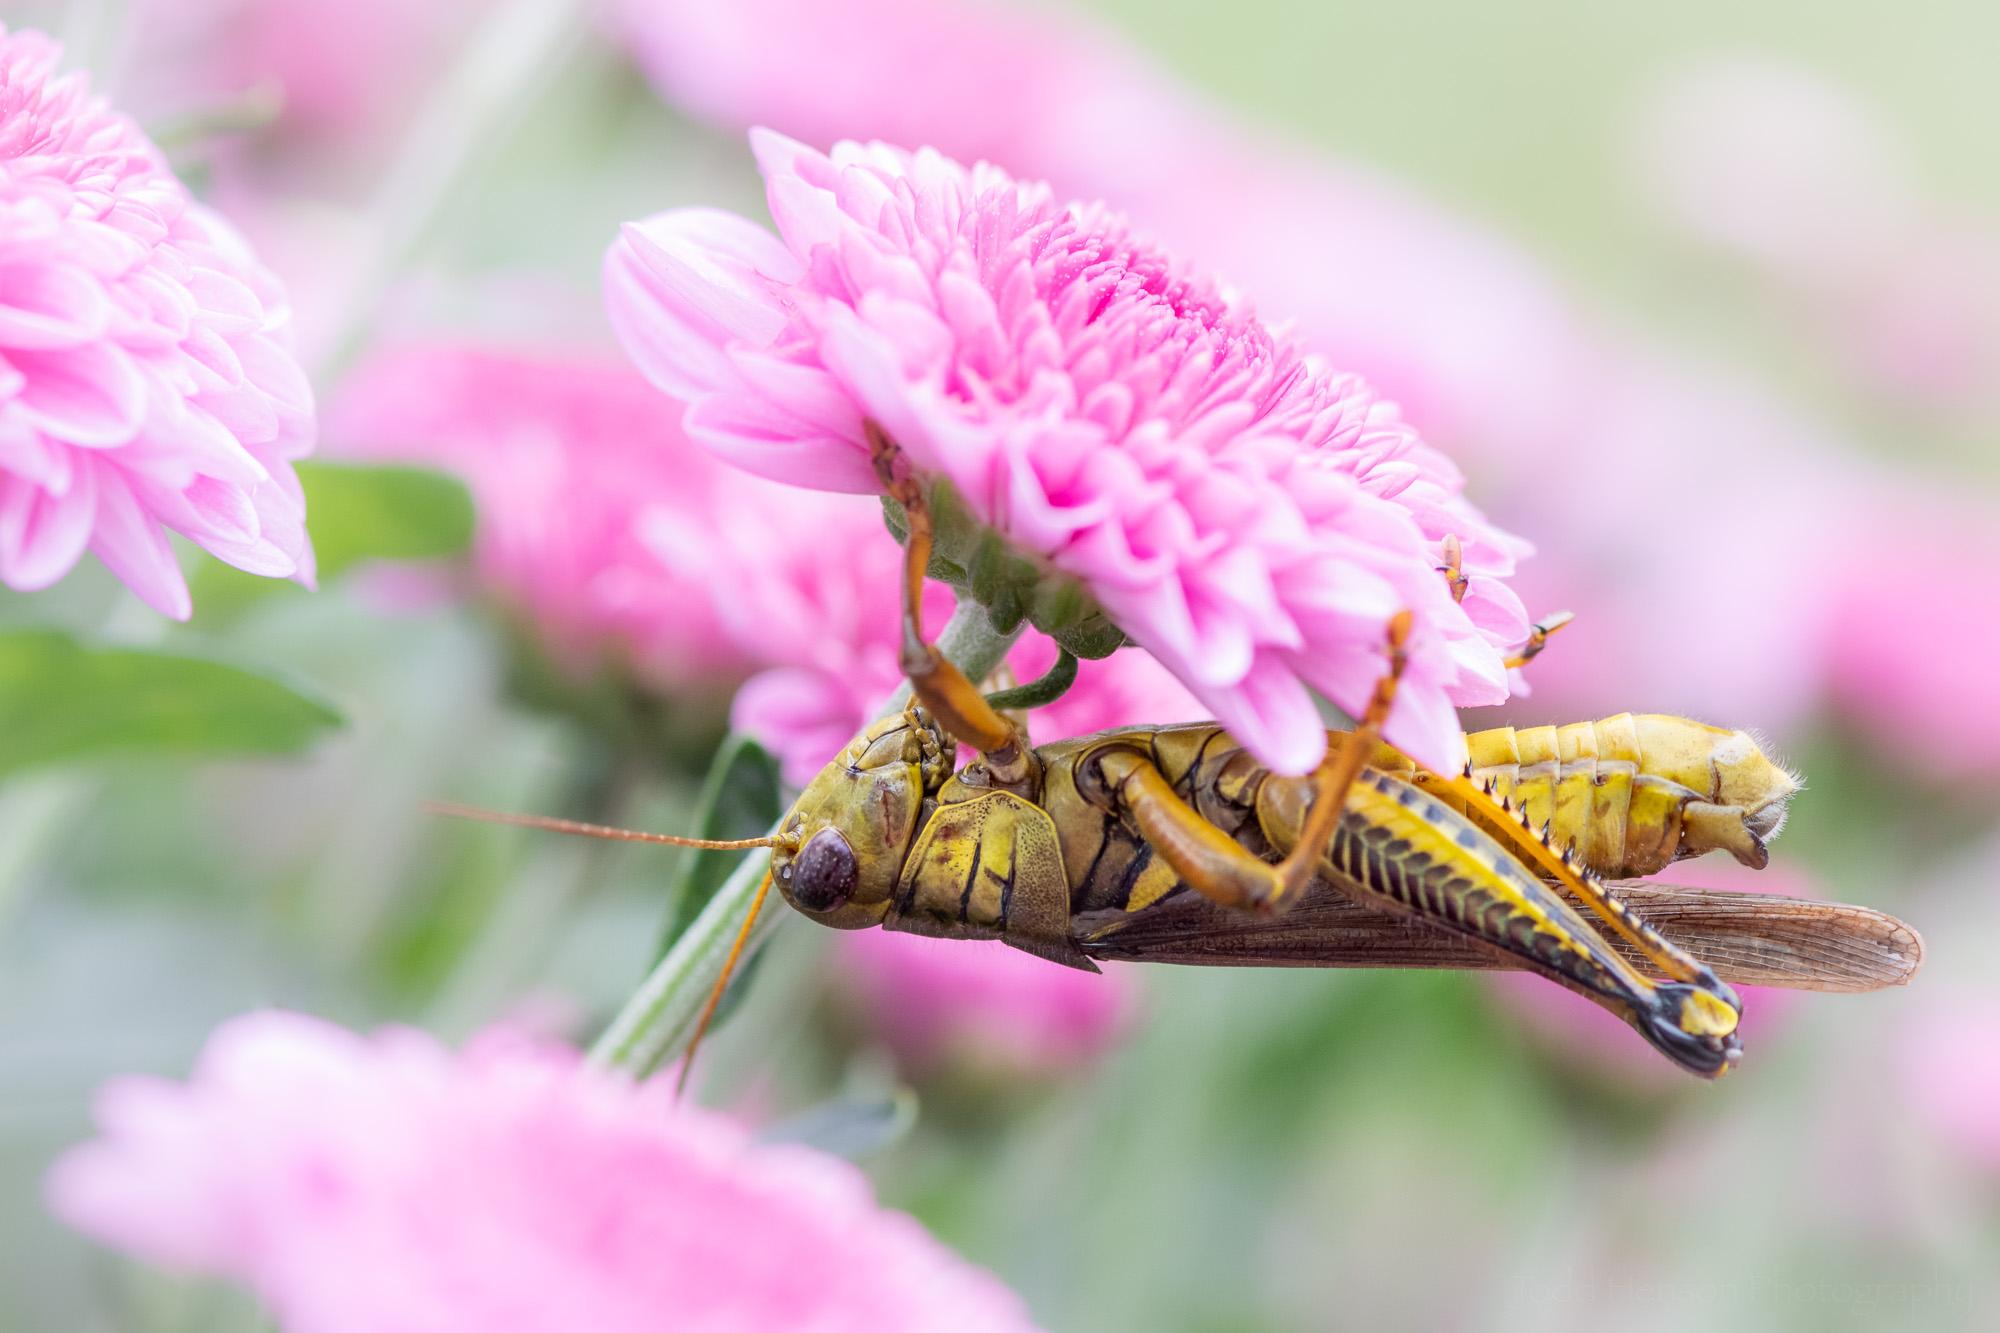 Under the Mum , the grasshopper hangs upside down under the chrysanthemum.